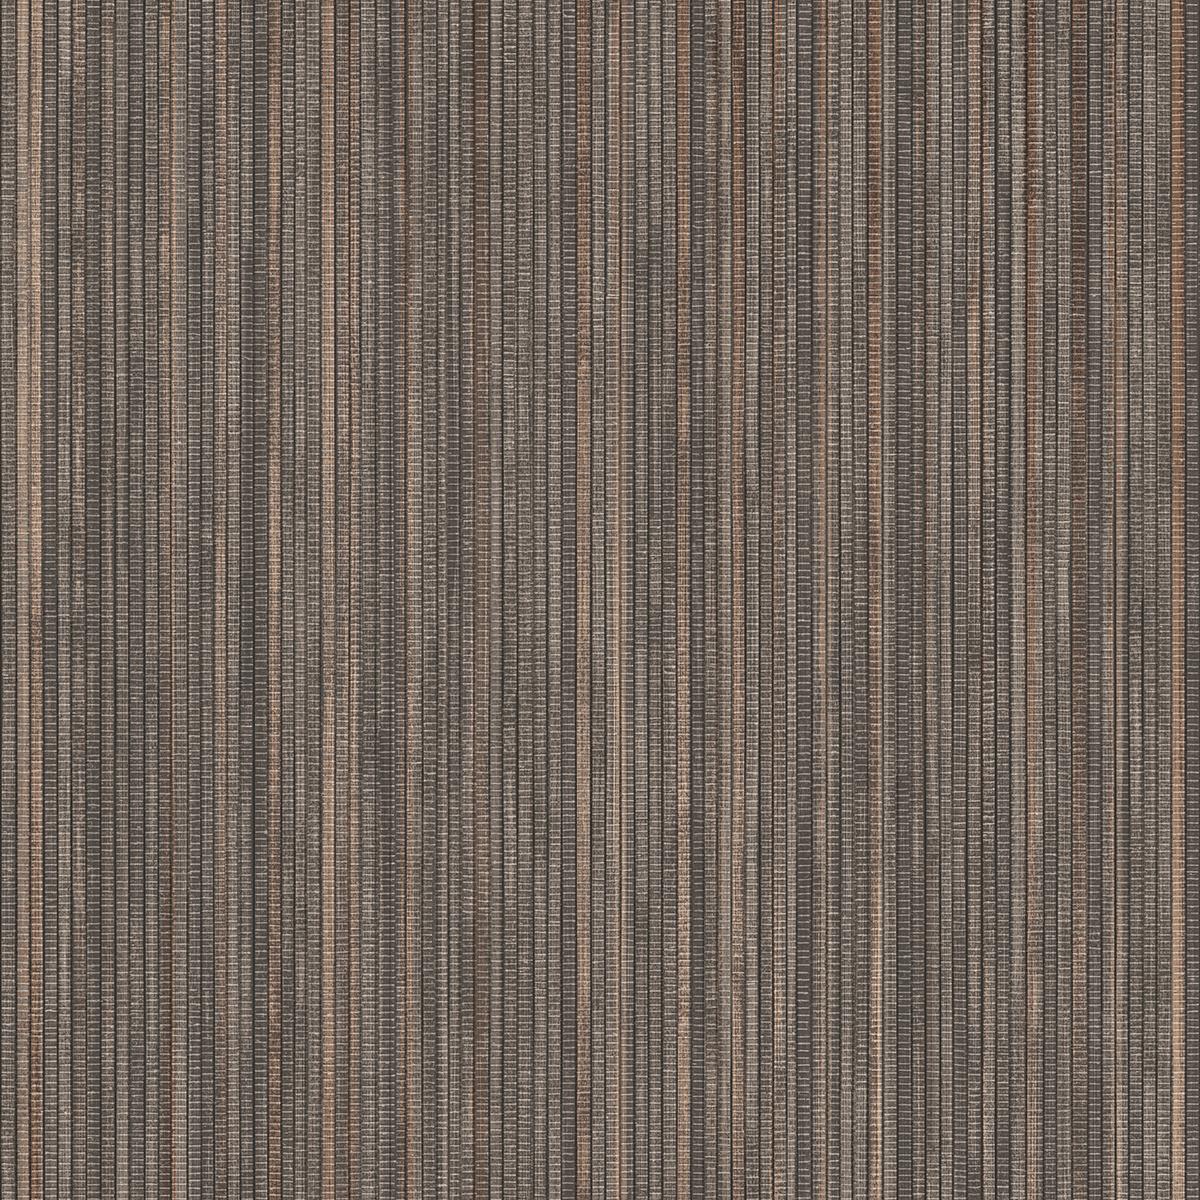 Grasscloth Bronze Textured Self Adhesive Wallpaper By Tempaper Peelable Wallpaper Grasscloth Wallpaper Grasscloth